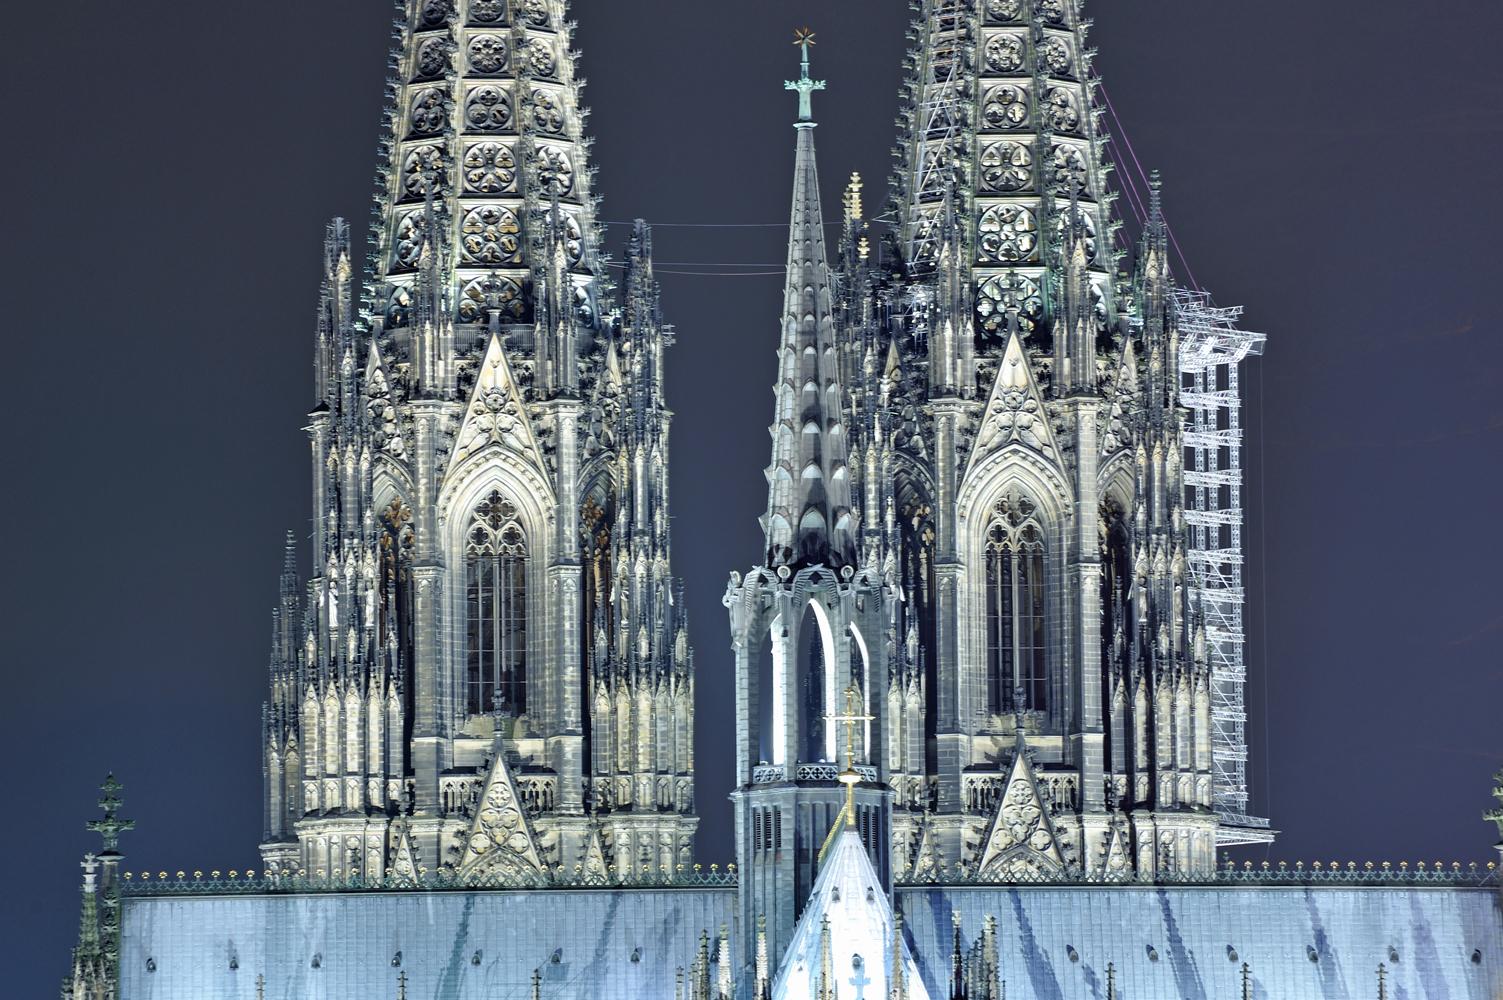 Nachtfotokurs am 5.10.2013 in Köln (5)